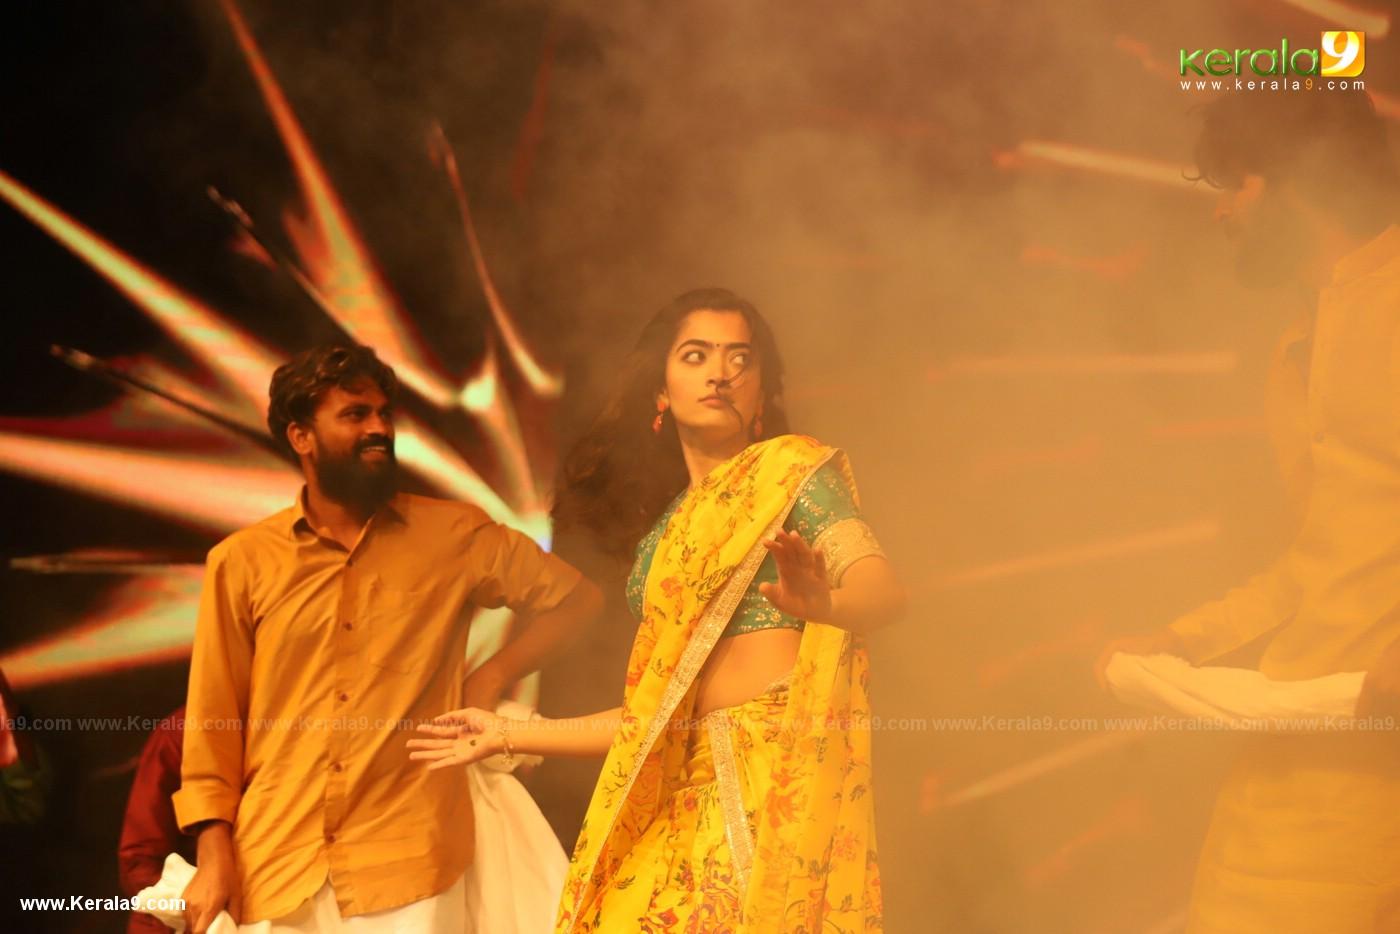 Dear Comrade movie premotion kerala kochi photos 157 - Kerala9.com